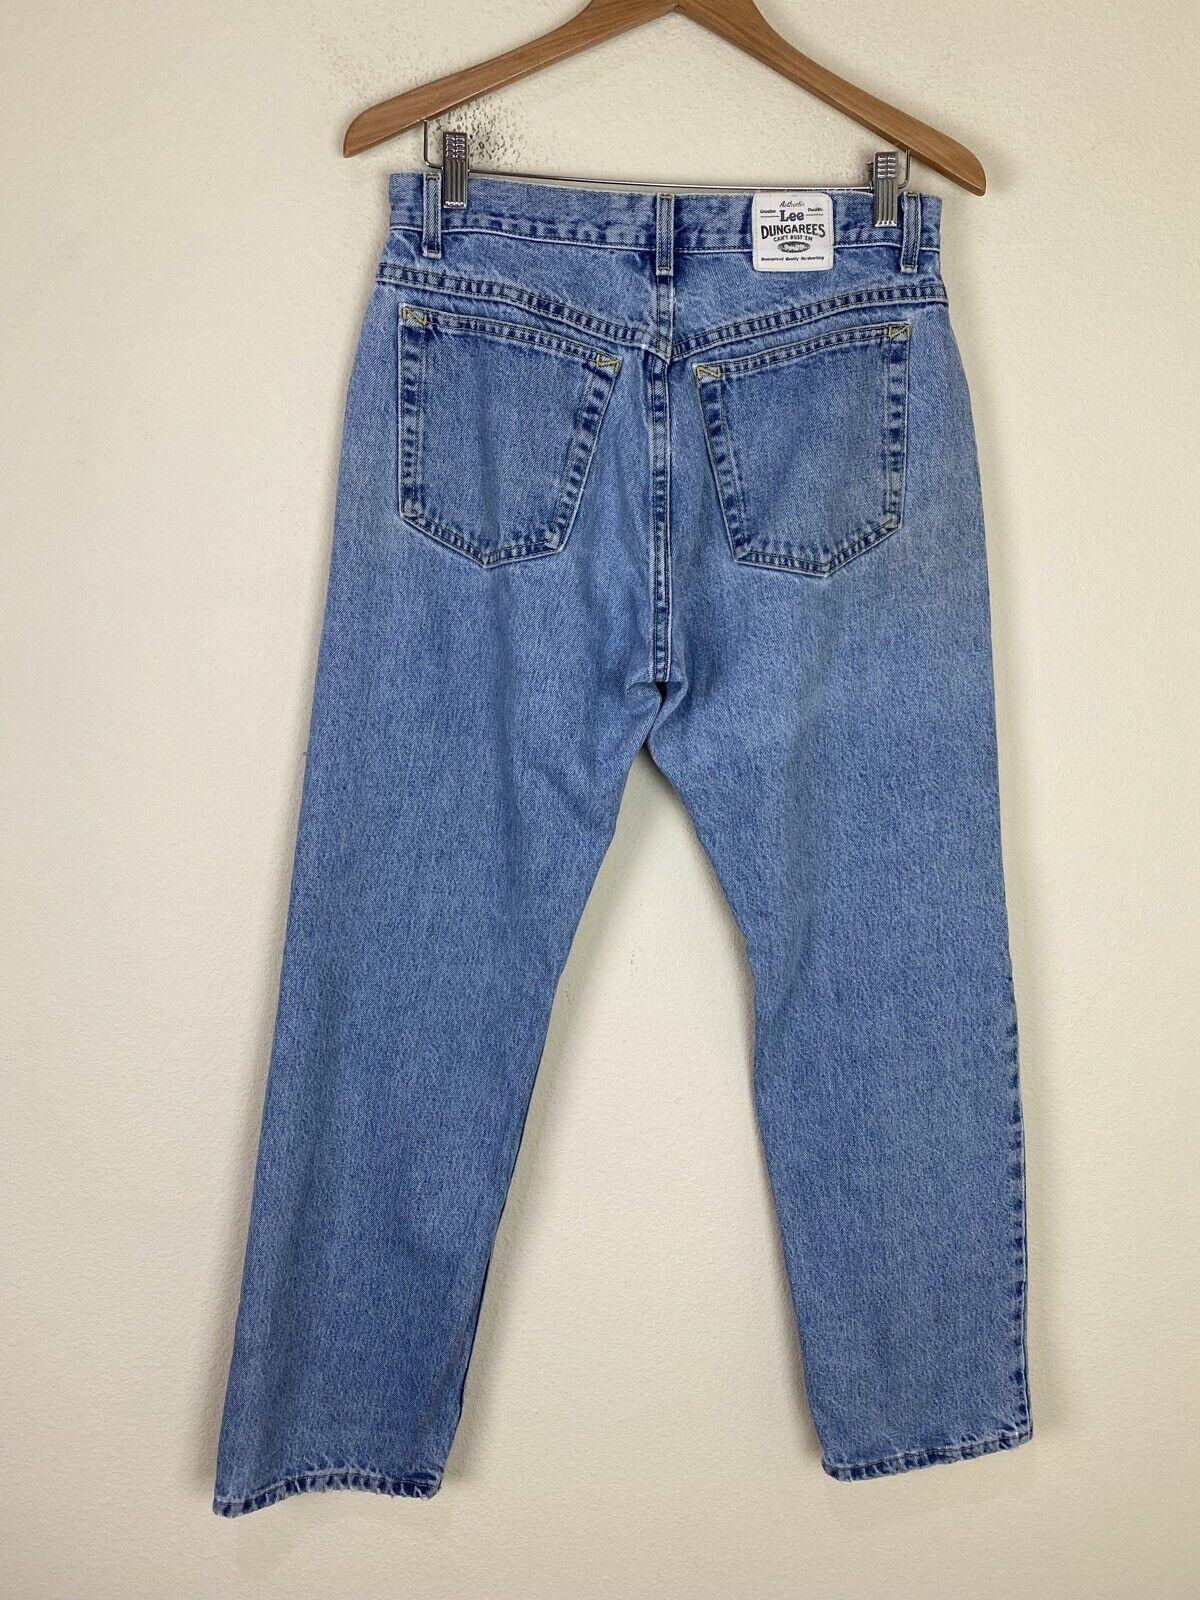 VTG 90s Y2K LEE Dungarees Denim Jeans 31x30 ACTUA… - image 1